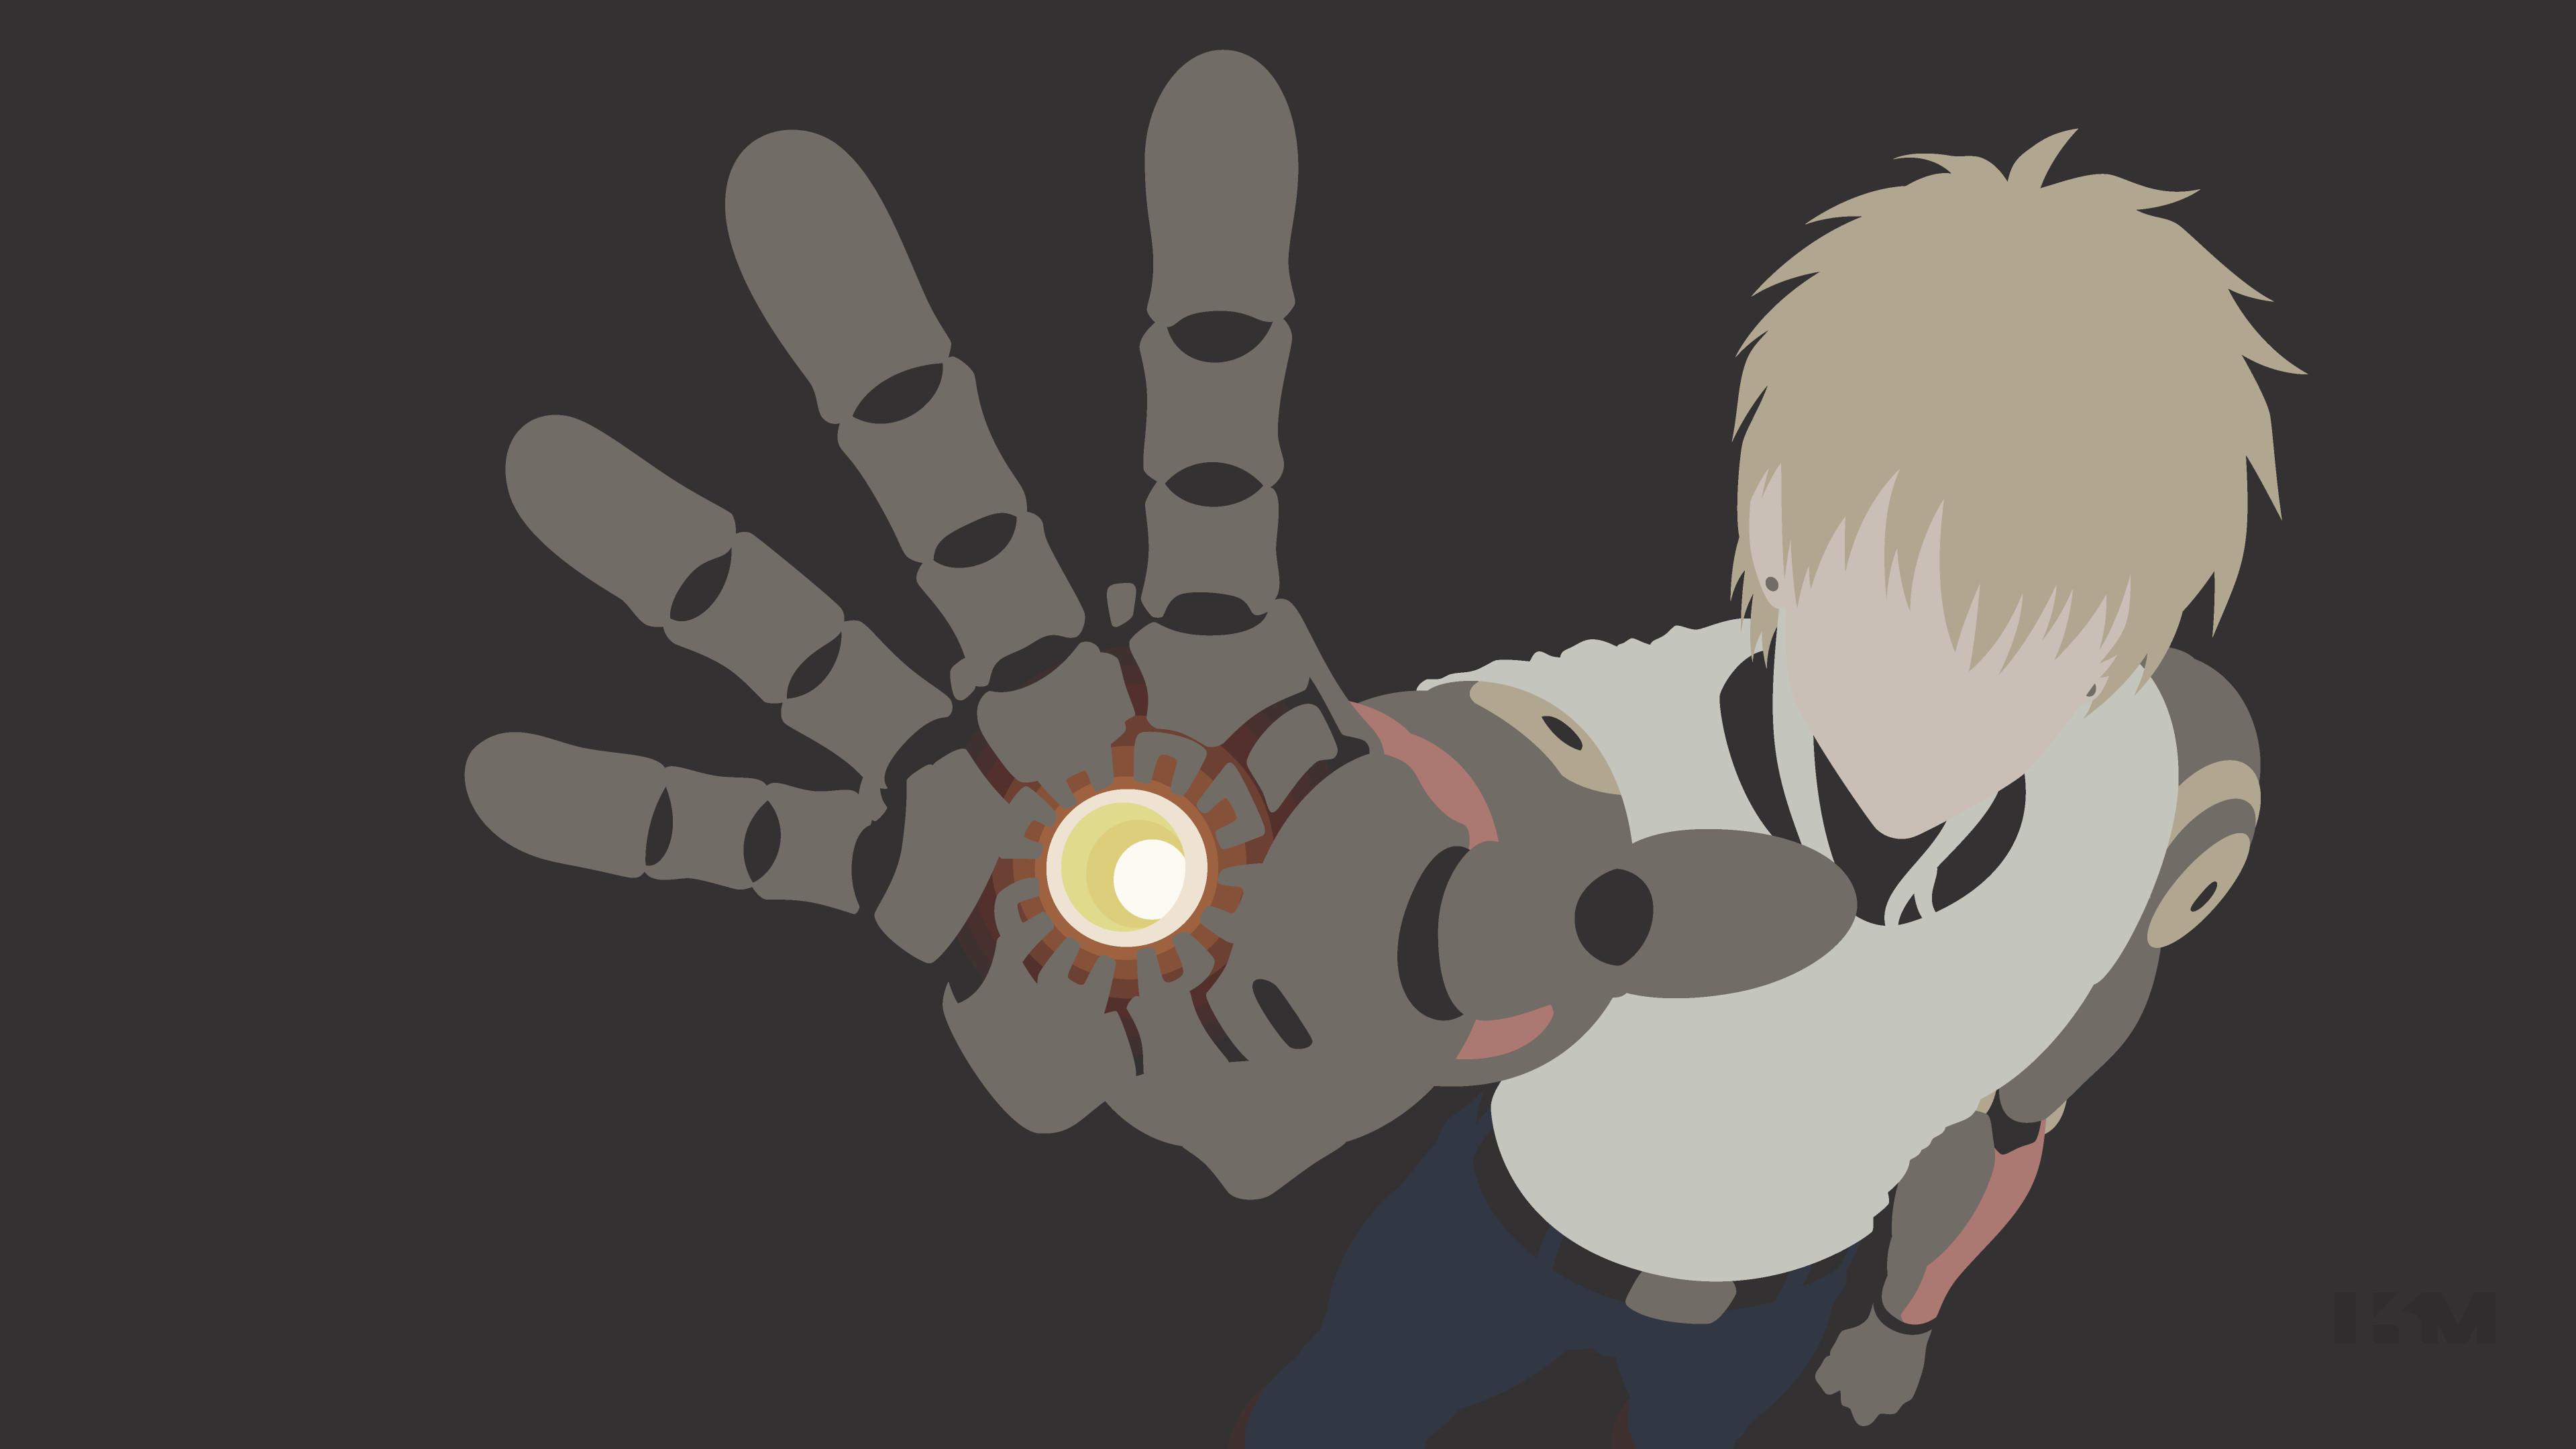 Anime One-Punch Man Genos Wallpaper   One Punch Man   Pinterest .